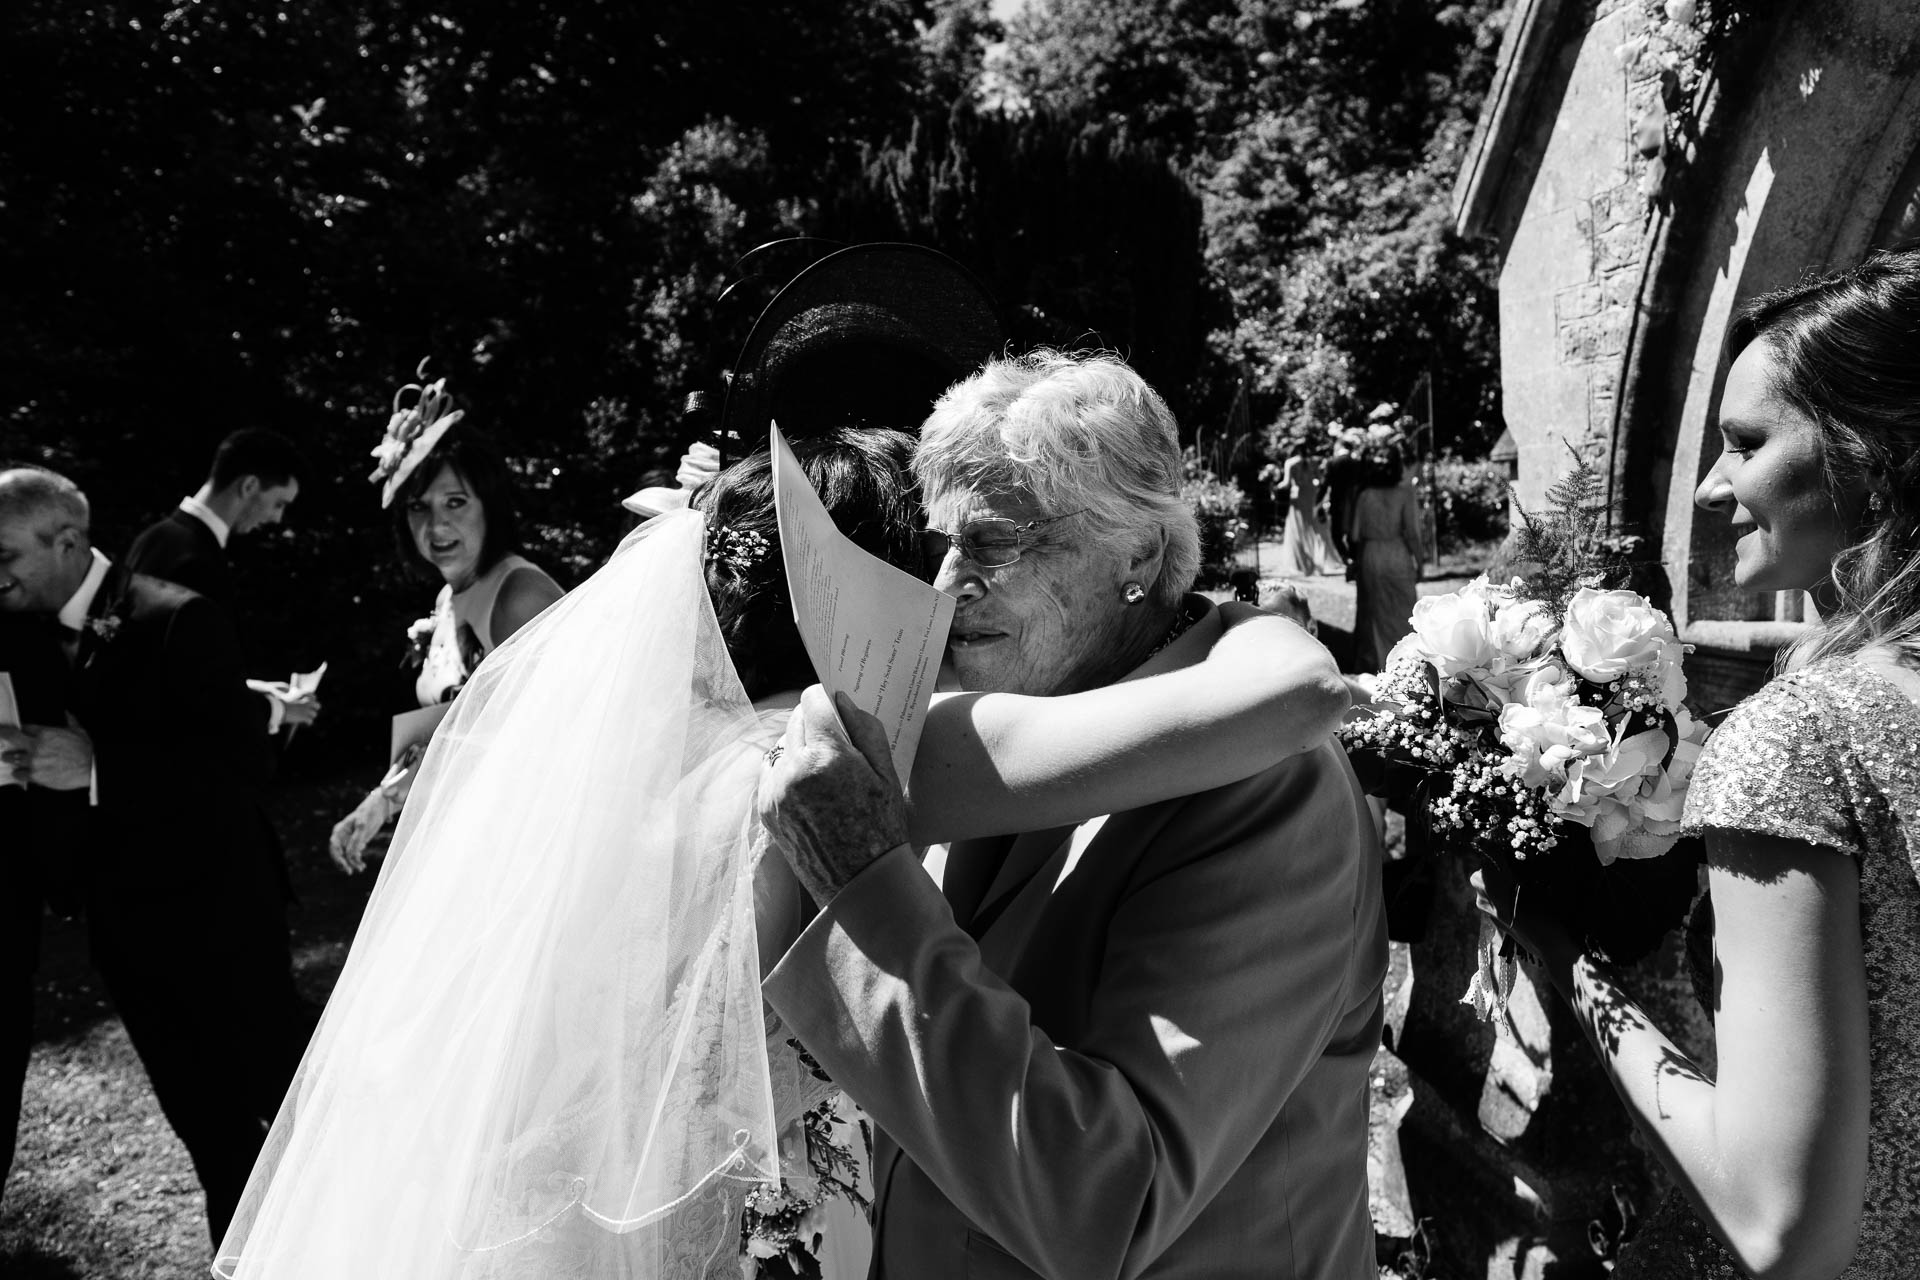 orchardleigh house wedding - Danni & Barney (166).jpg